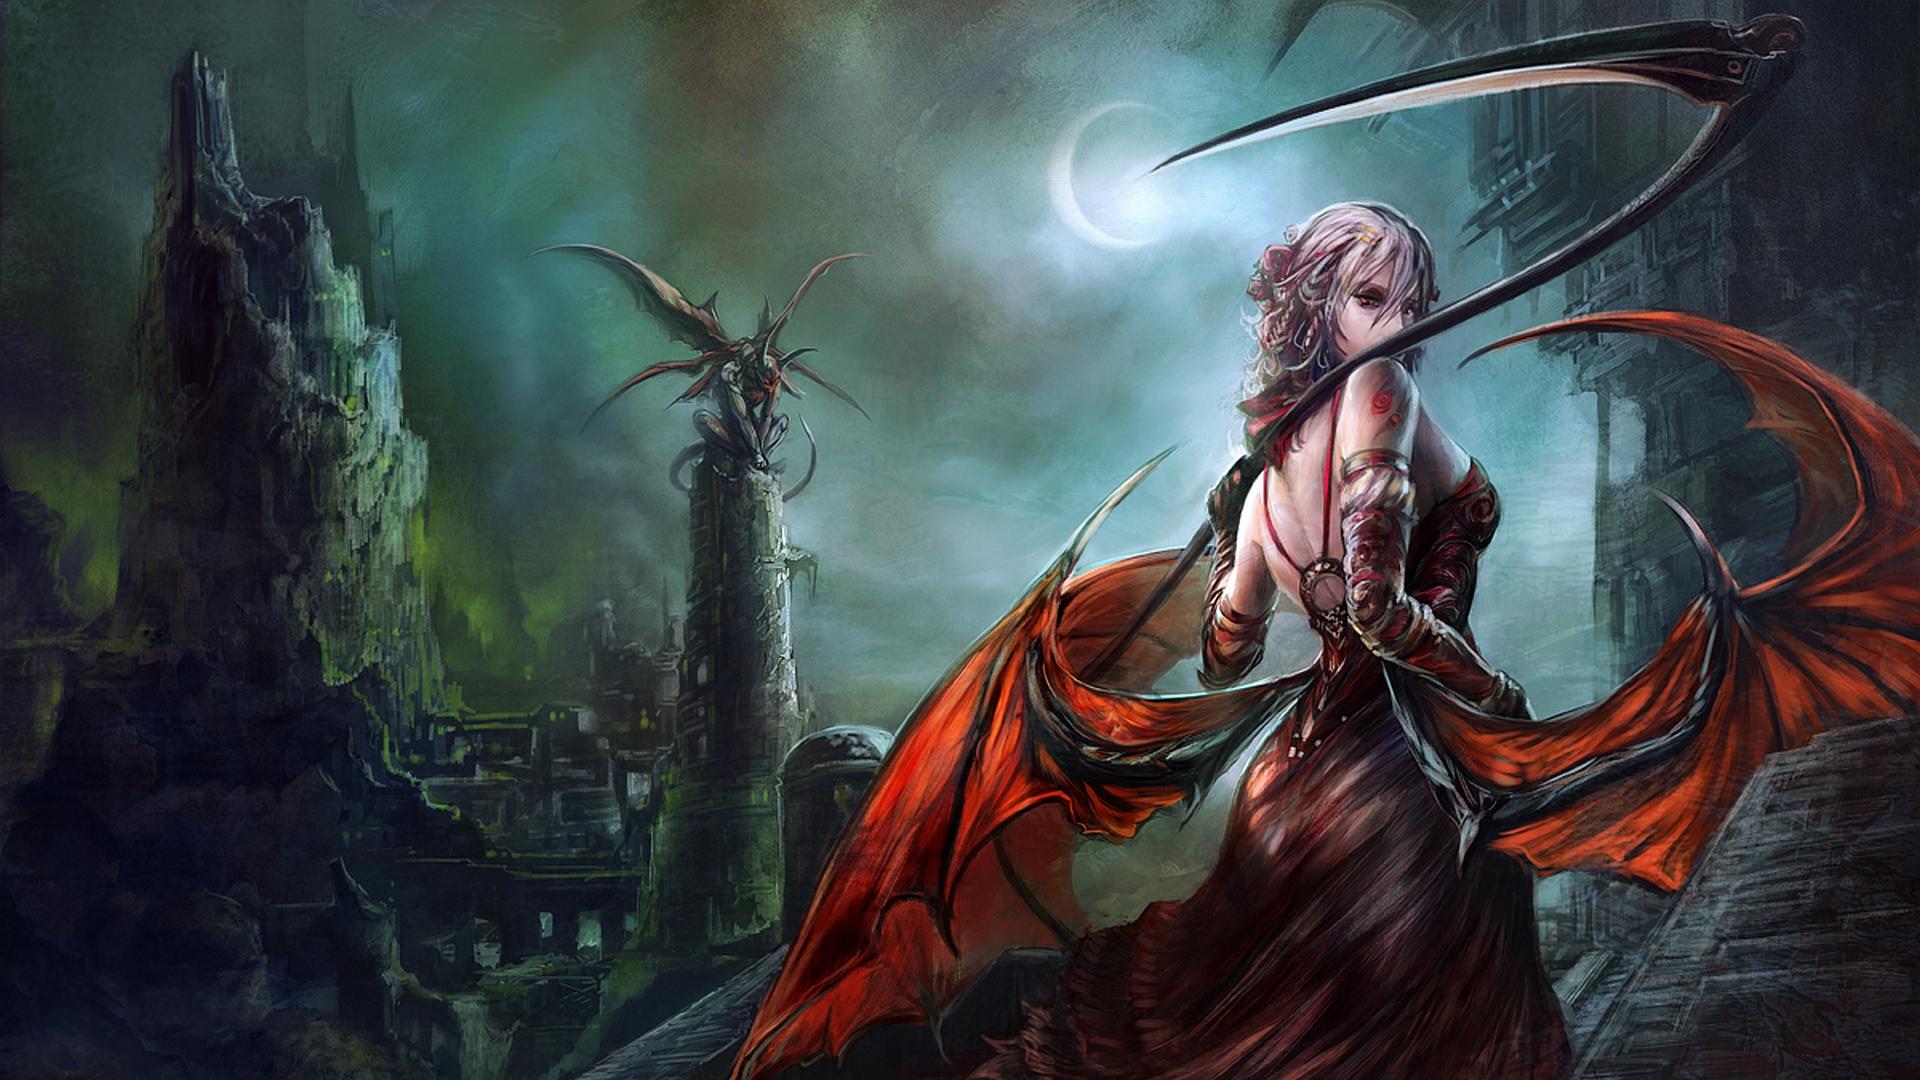 Demon queen full hd wallpaper and background image 1920x1080 id fantasy women warrior wallpaper voltagebd Choice Image